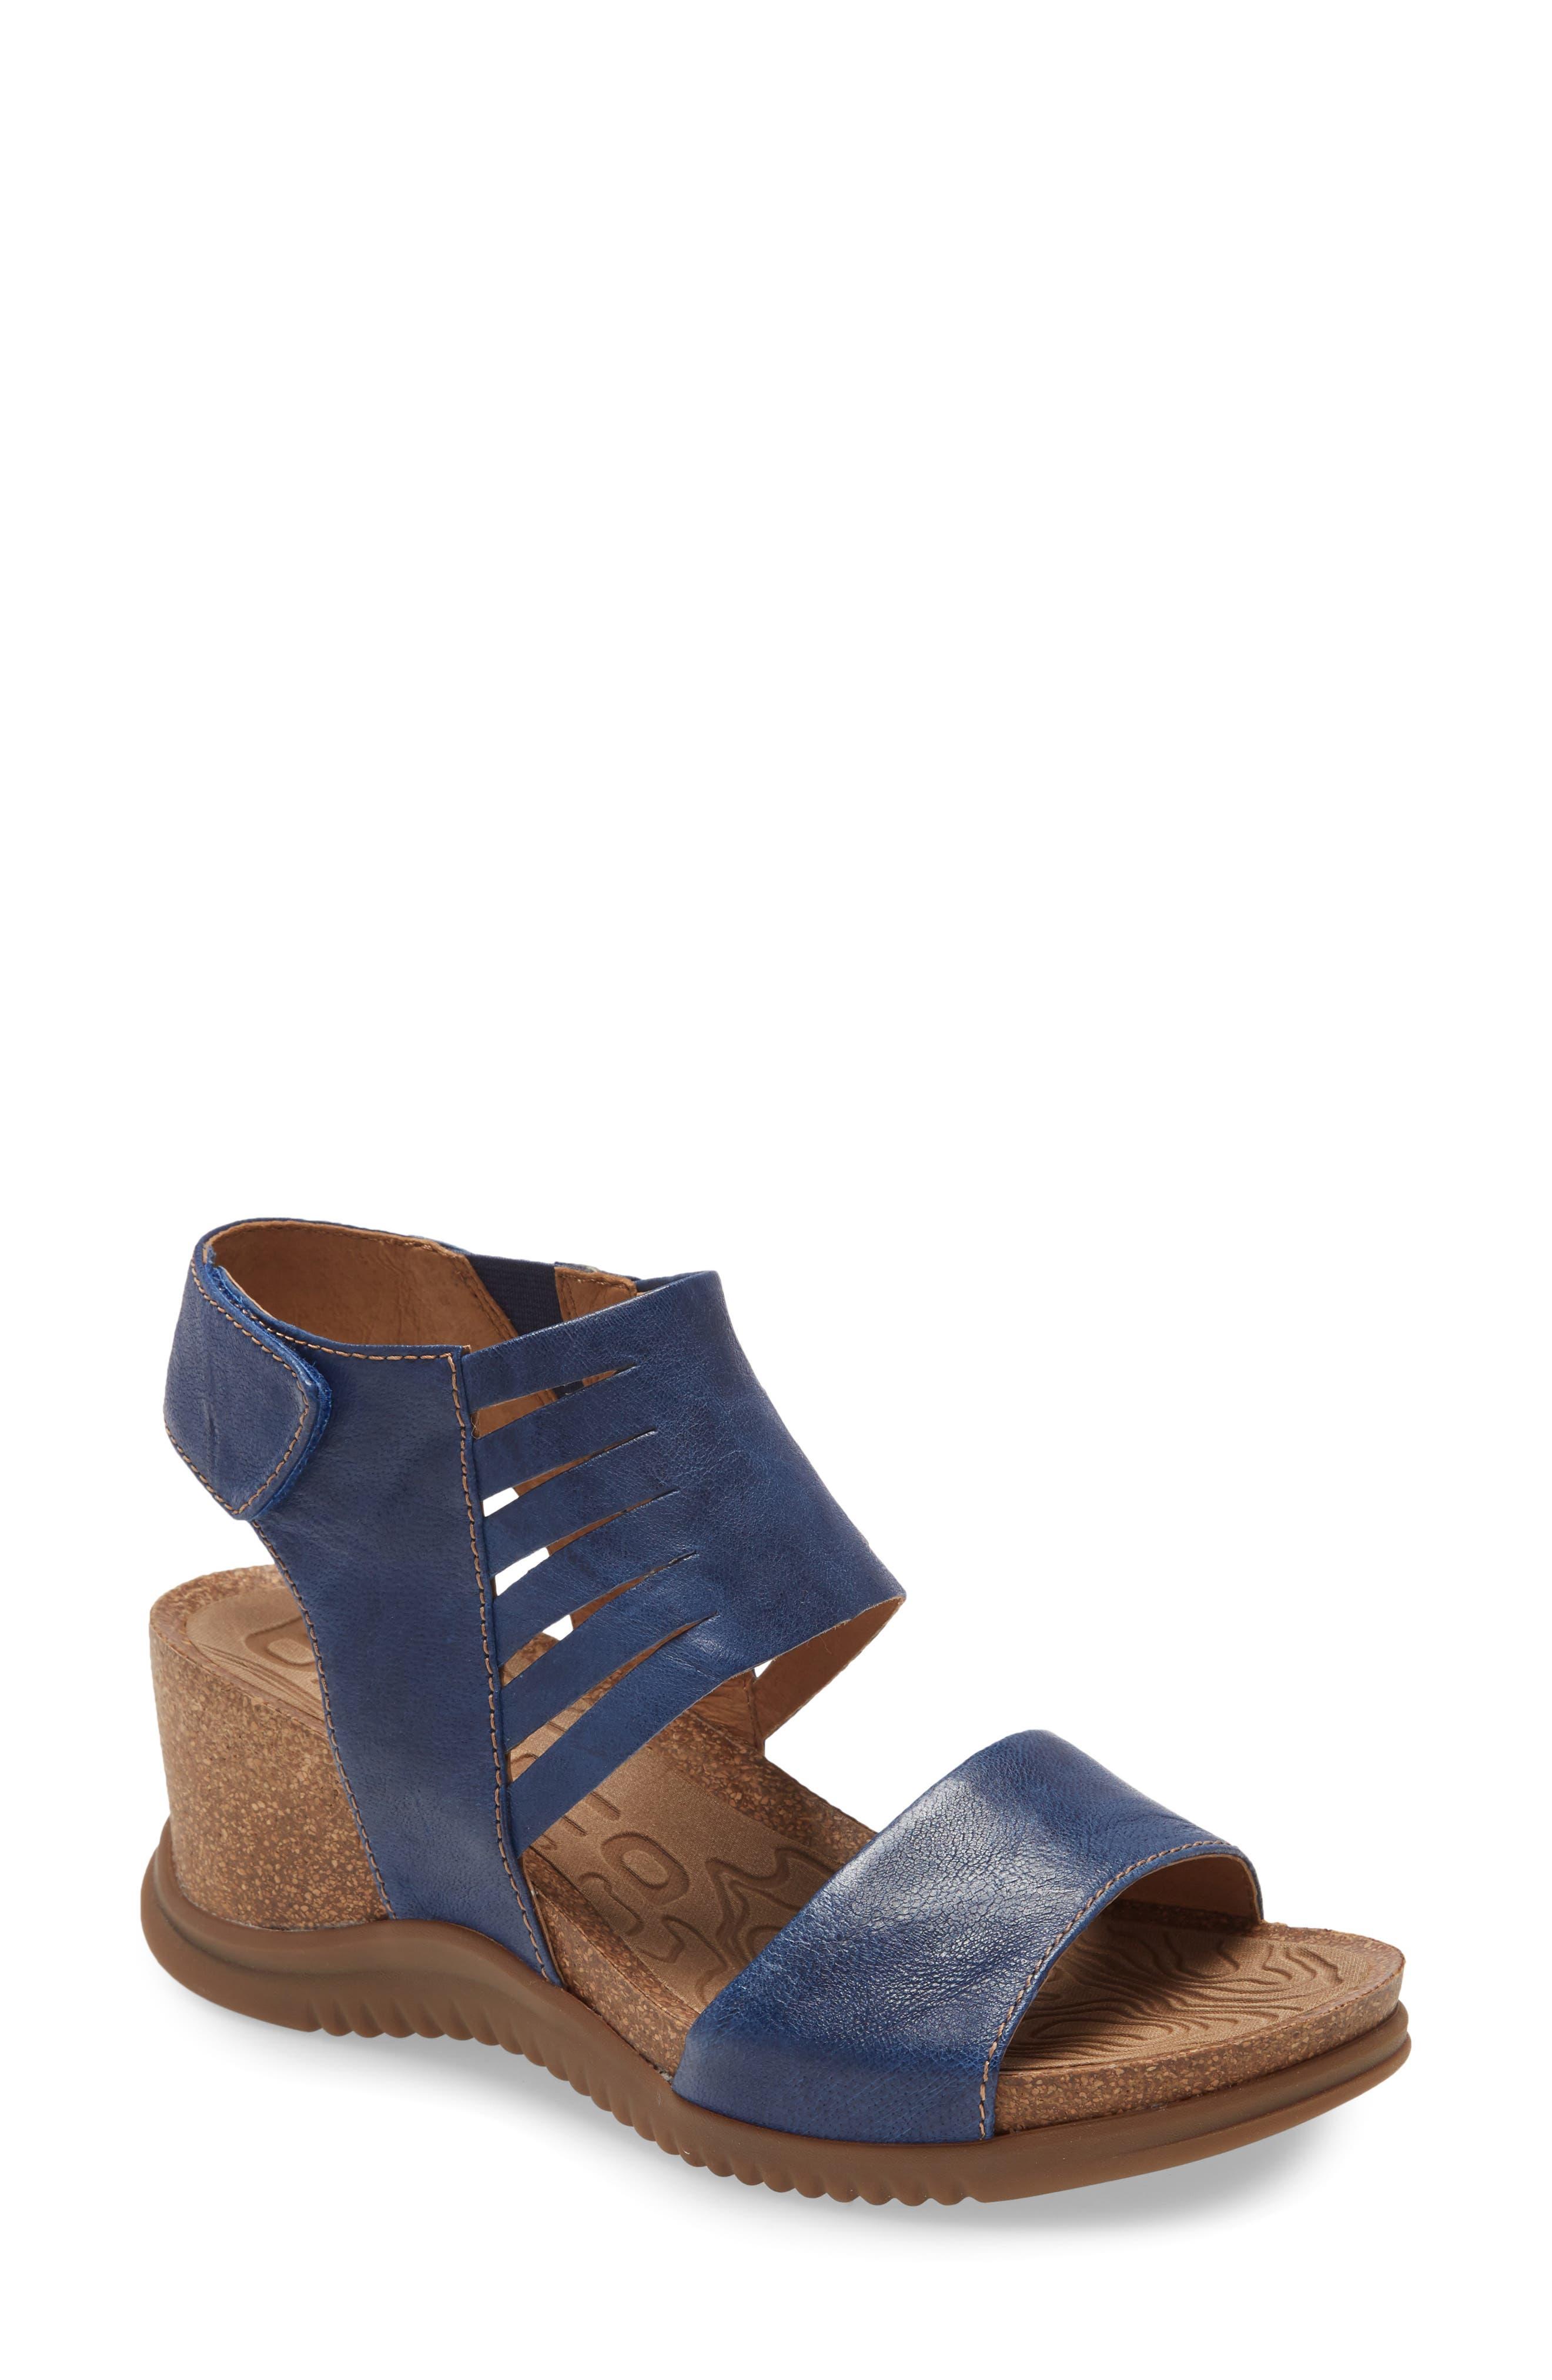 Women's Bionica Gracen Wedge Sandal, Size 6.5 M - Blue